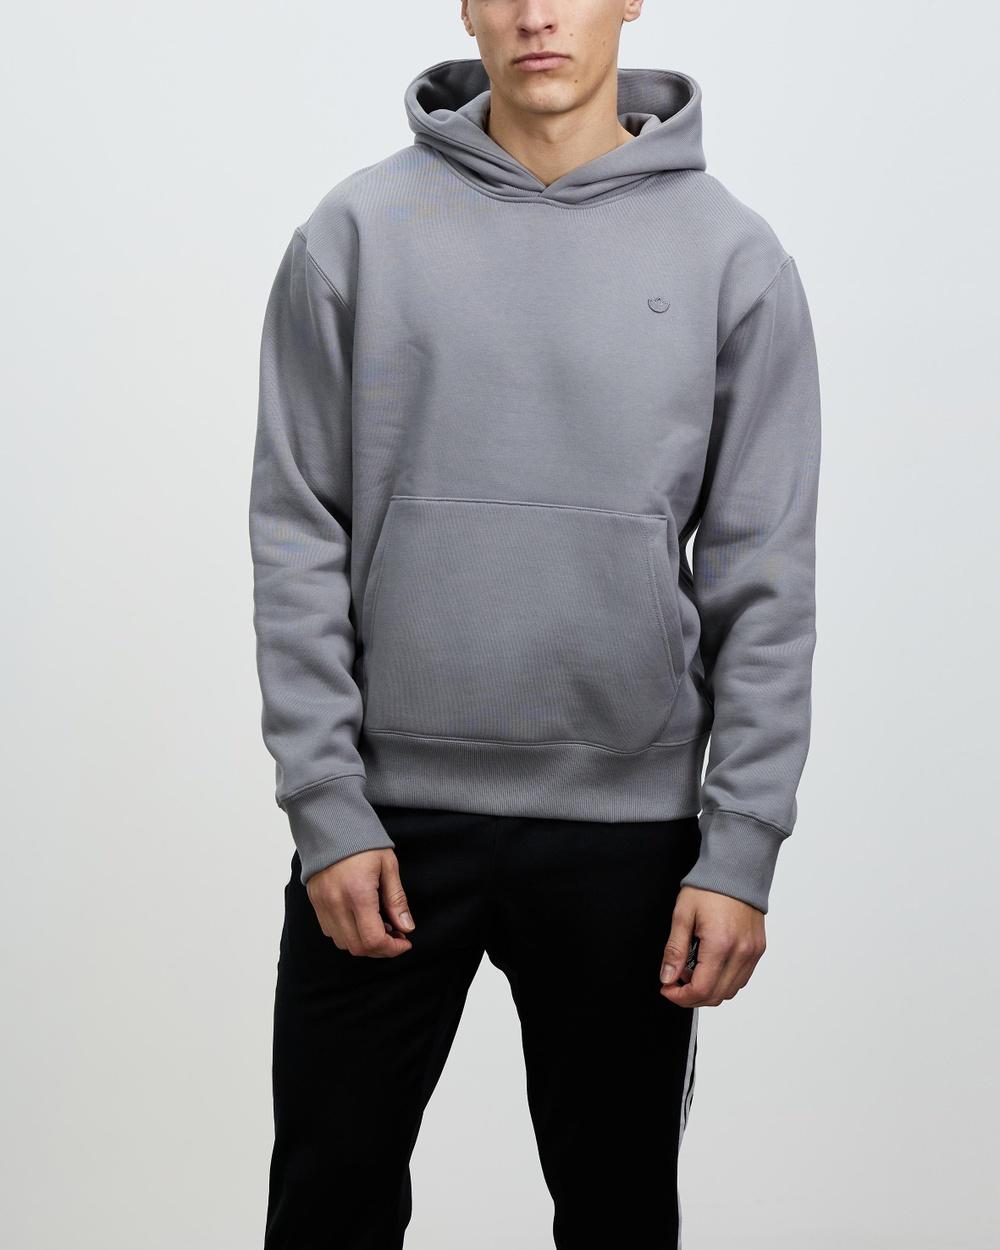 adidas Originals C Hoodie Hoodies Grey Three